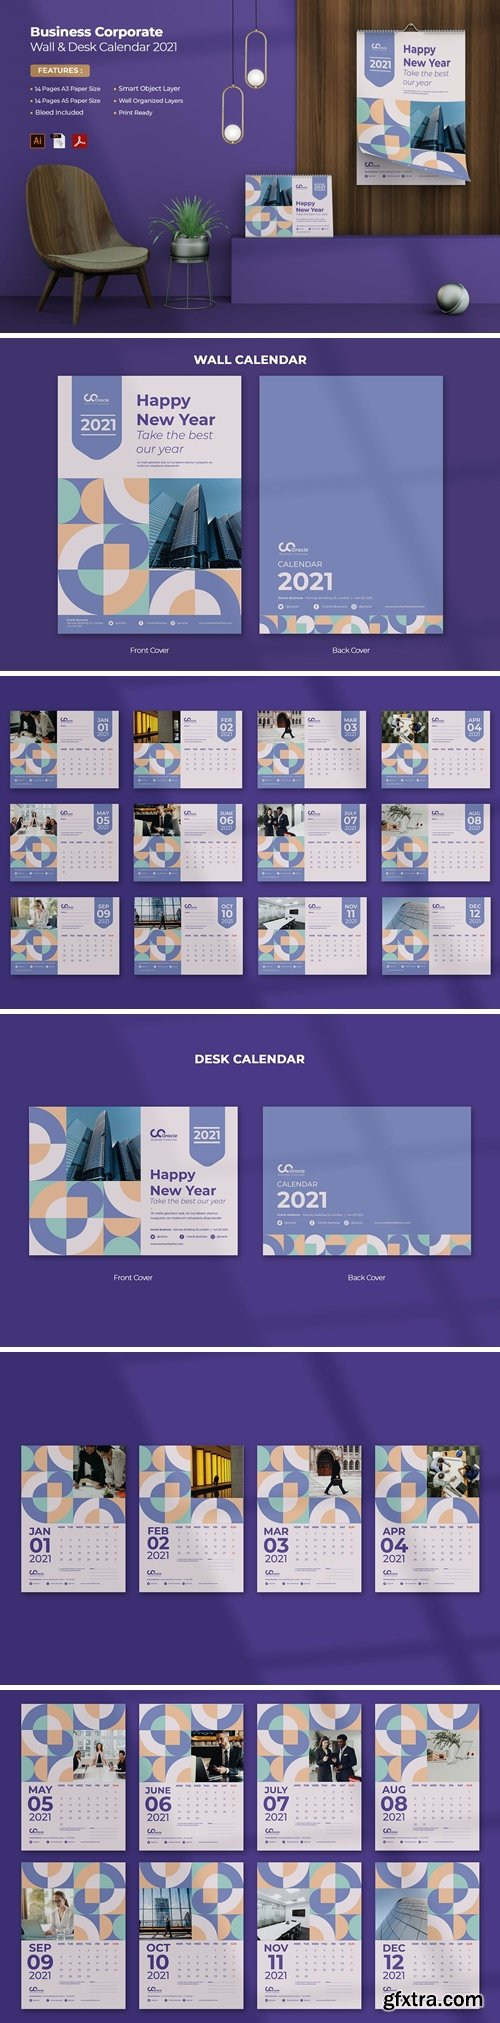 Business Corporate Wall & Desk Calendar 2021